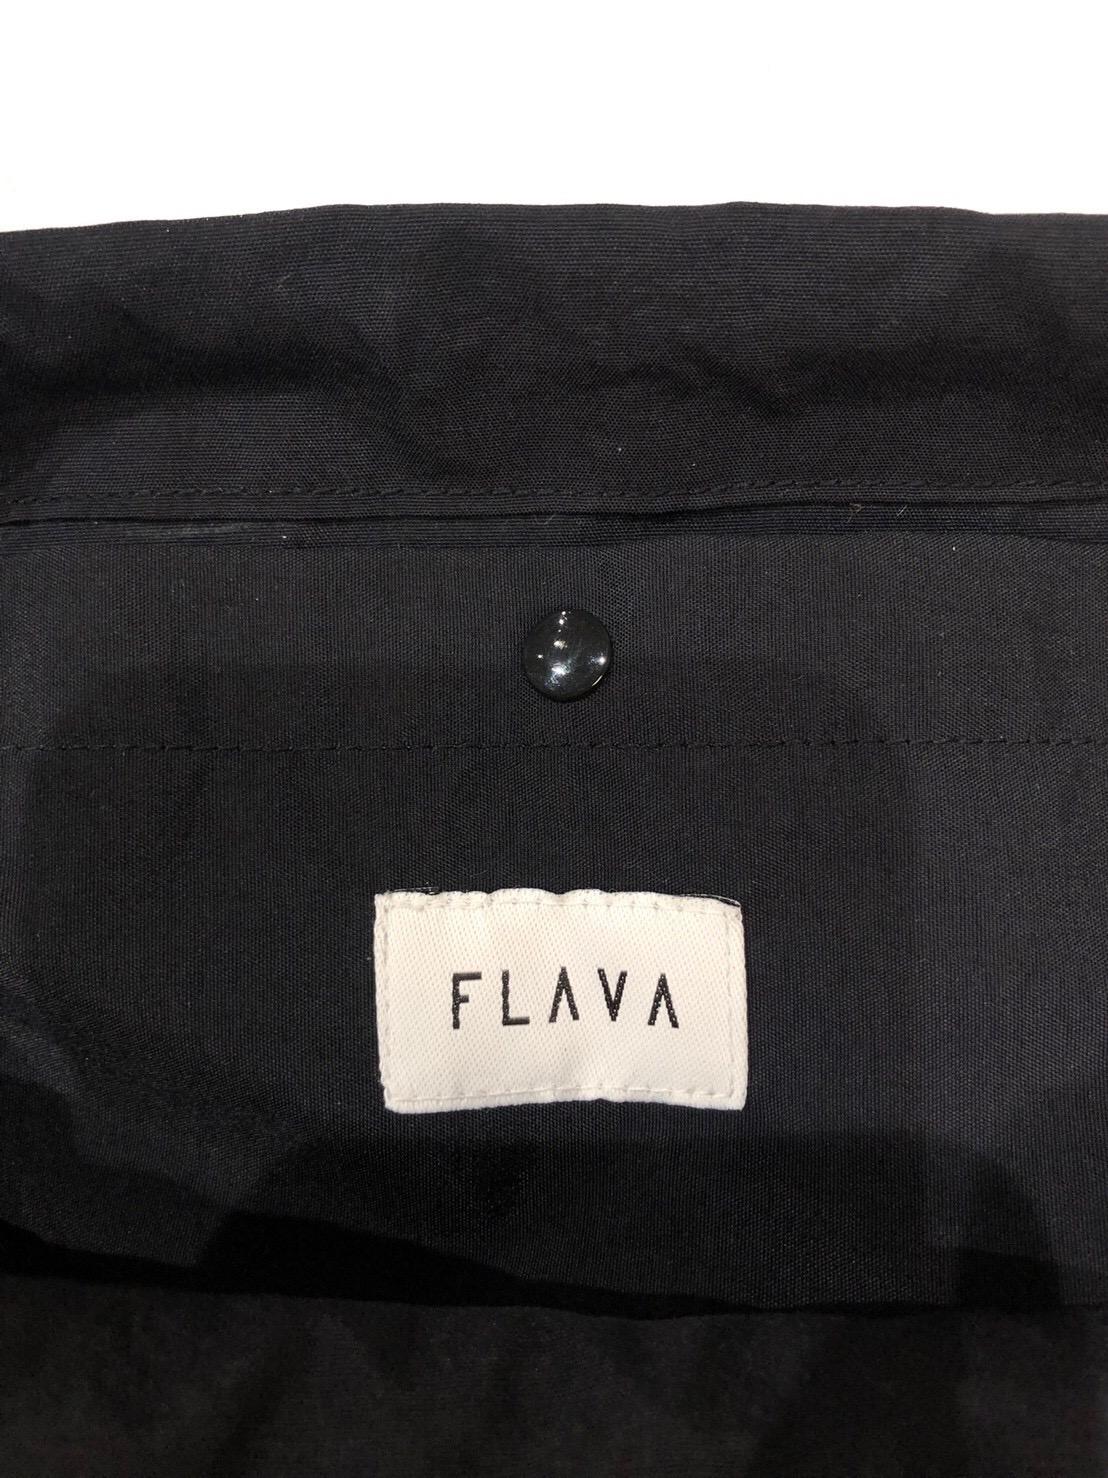 FLAVA